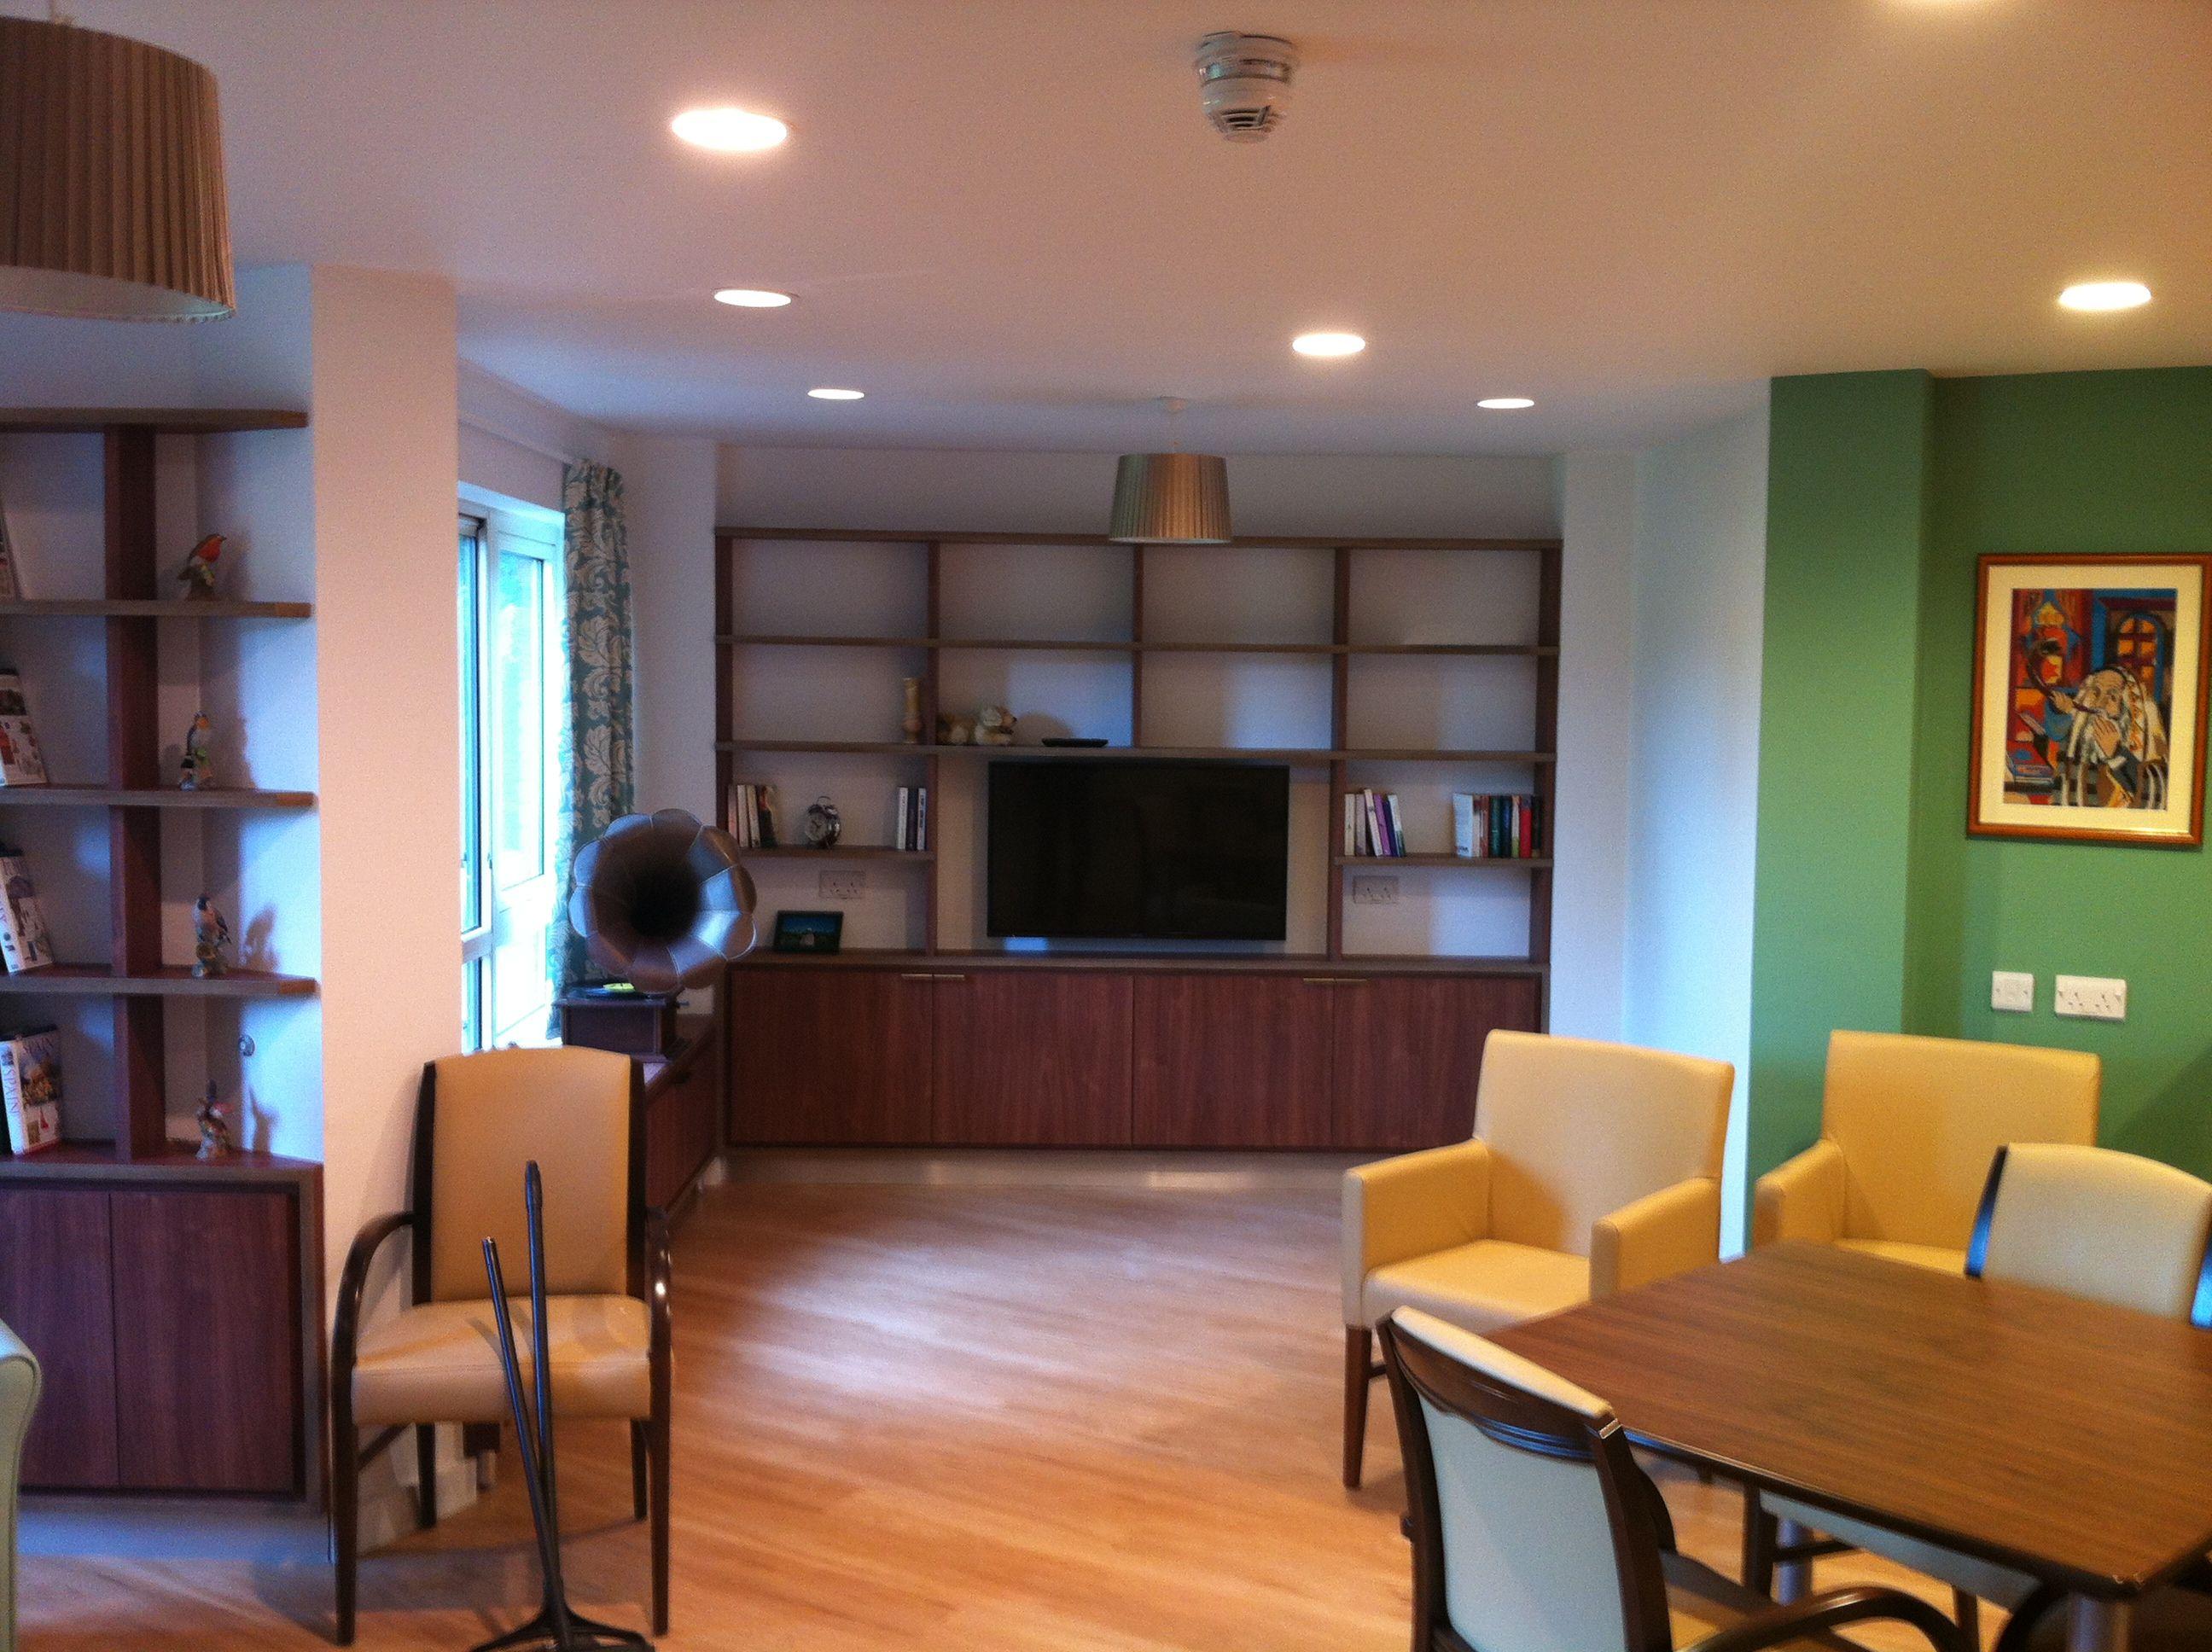 48+ Bridge home health care ideas